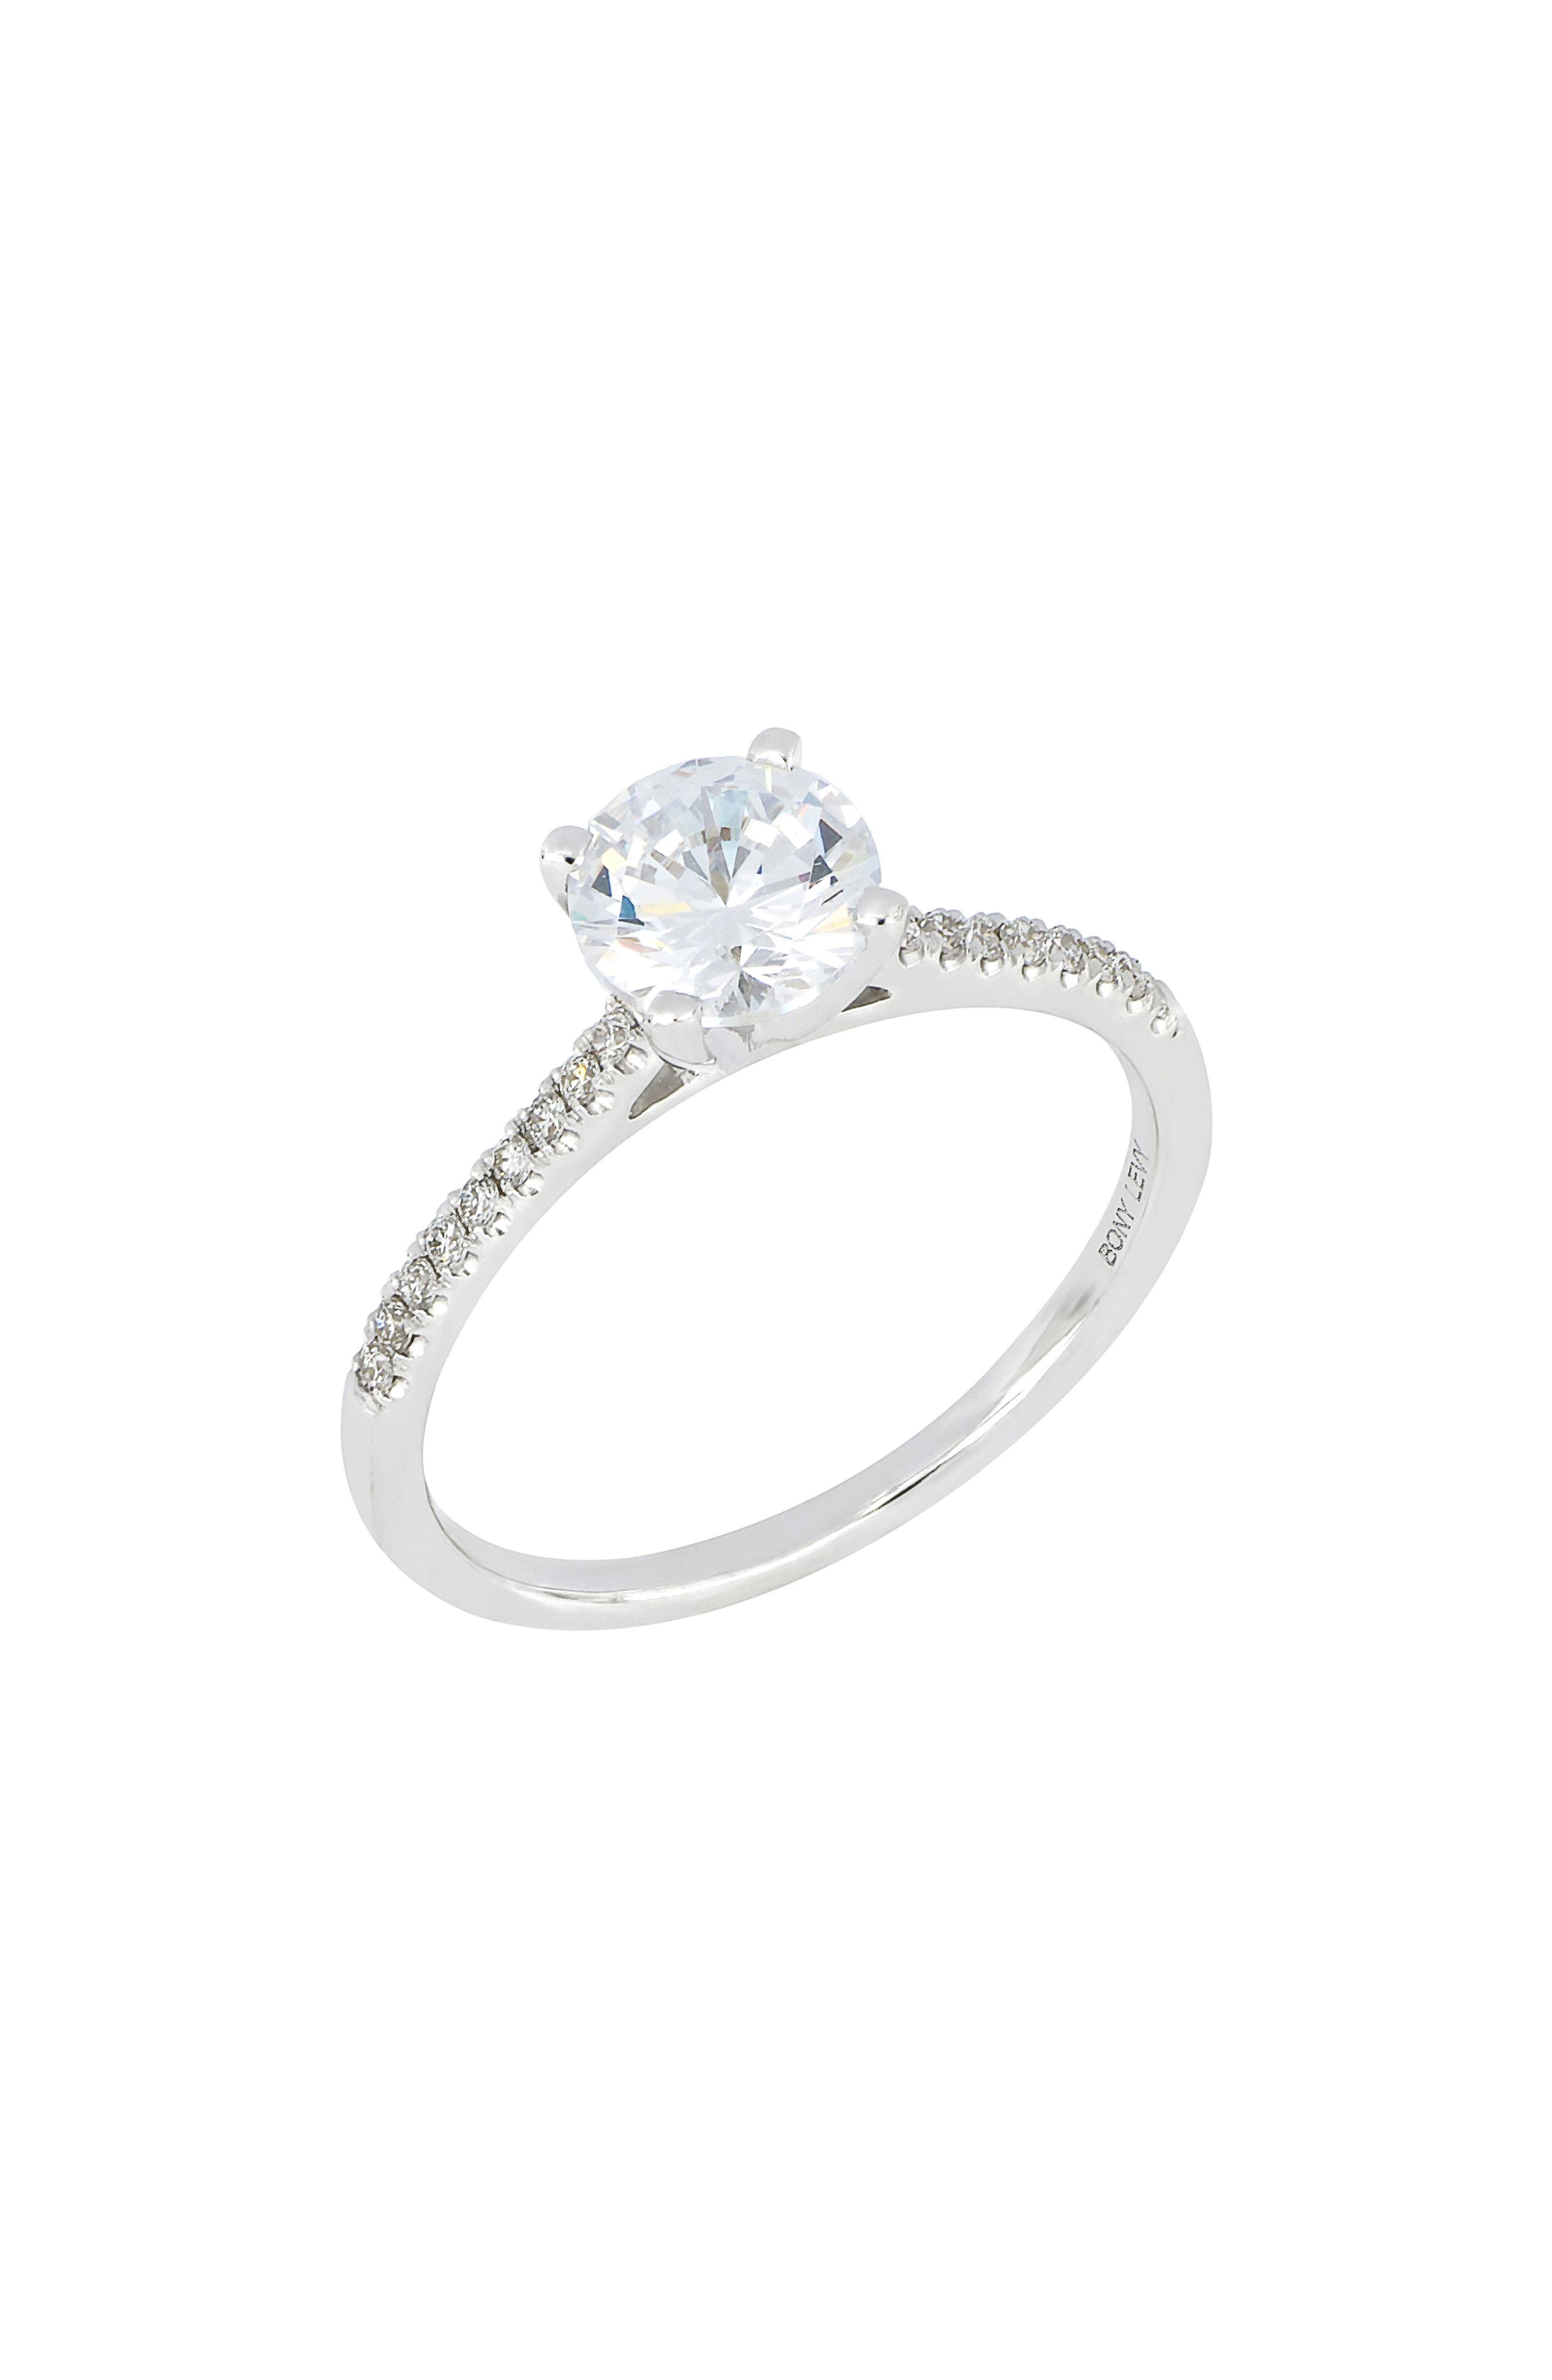 Pavé Diamond Round Engagement Ring Setting,                             Main thumbnail 1, color,                             WHITE GOLD